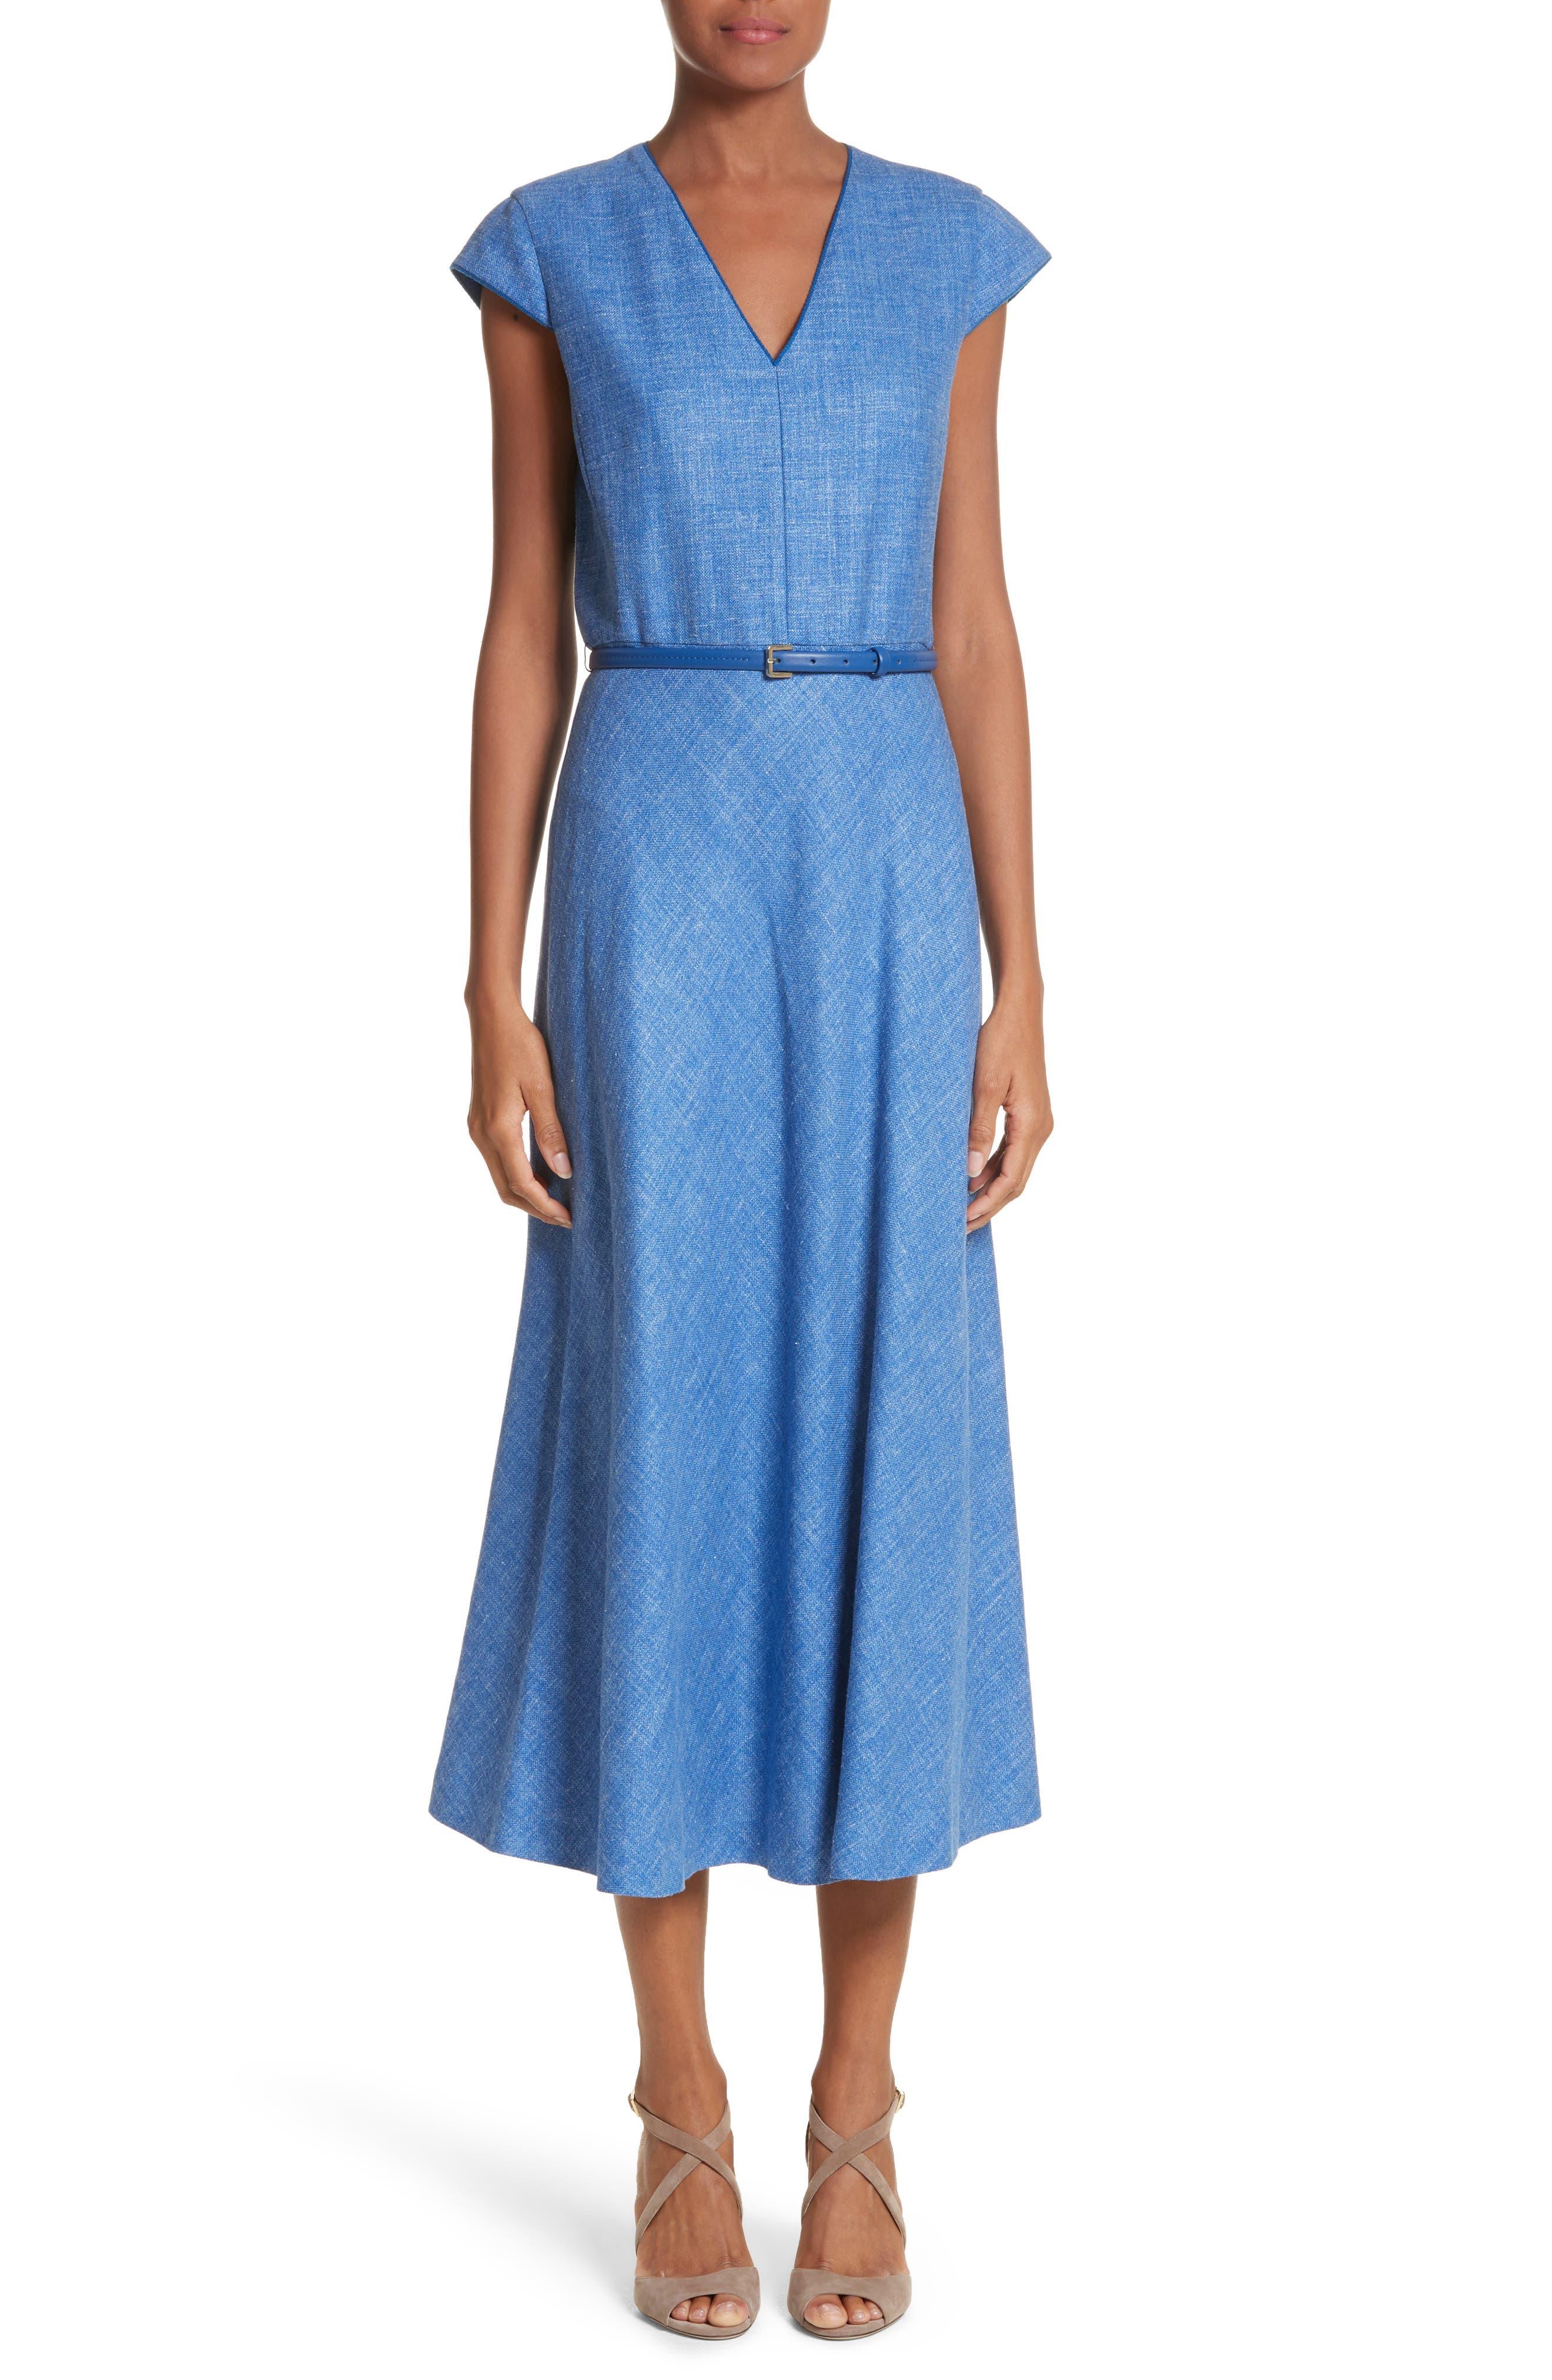 Caramba Silk, Linen & Wool Midi Dress,                         Main,                         color, Cornflower Blue